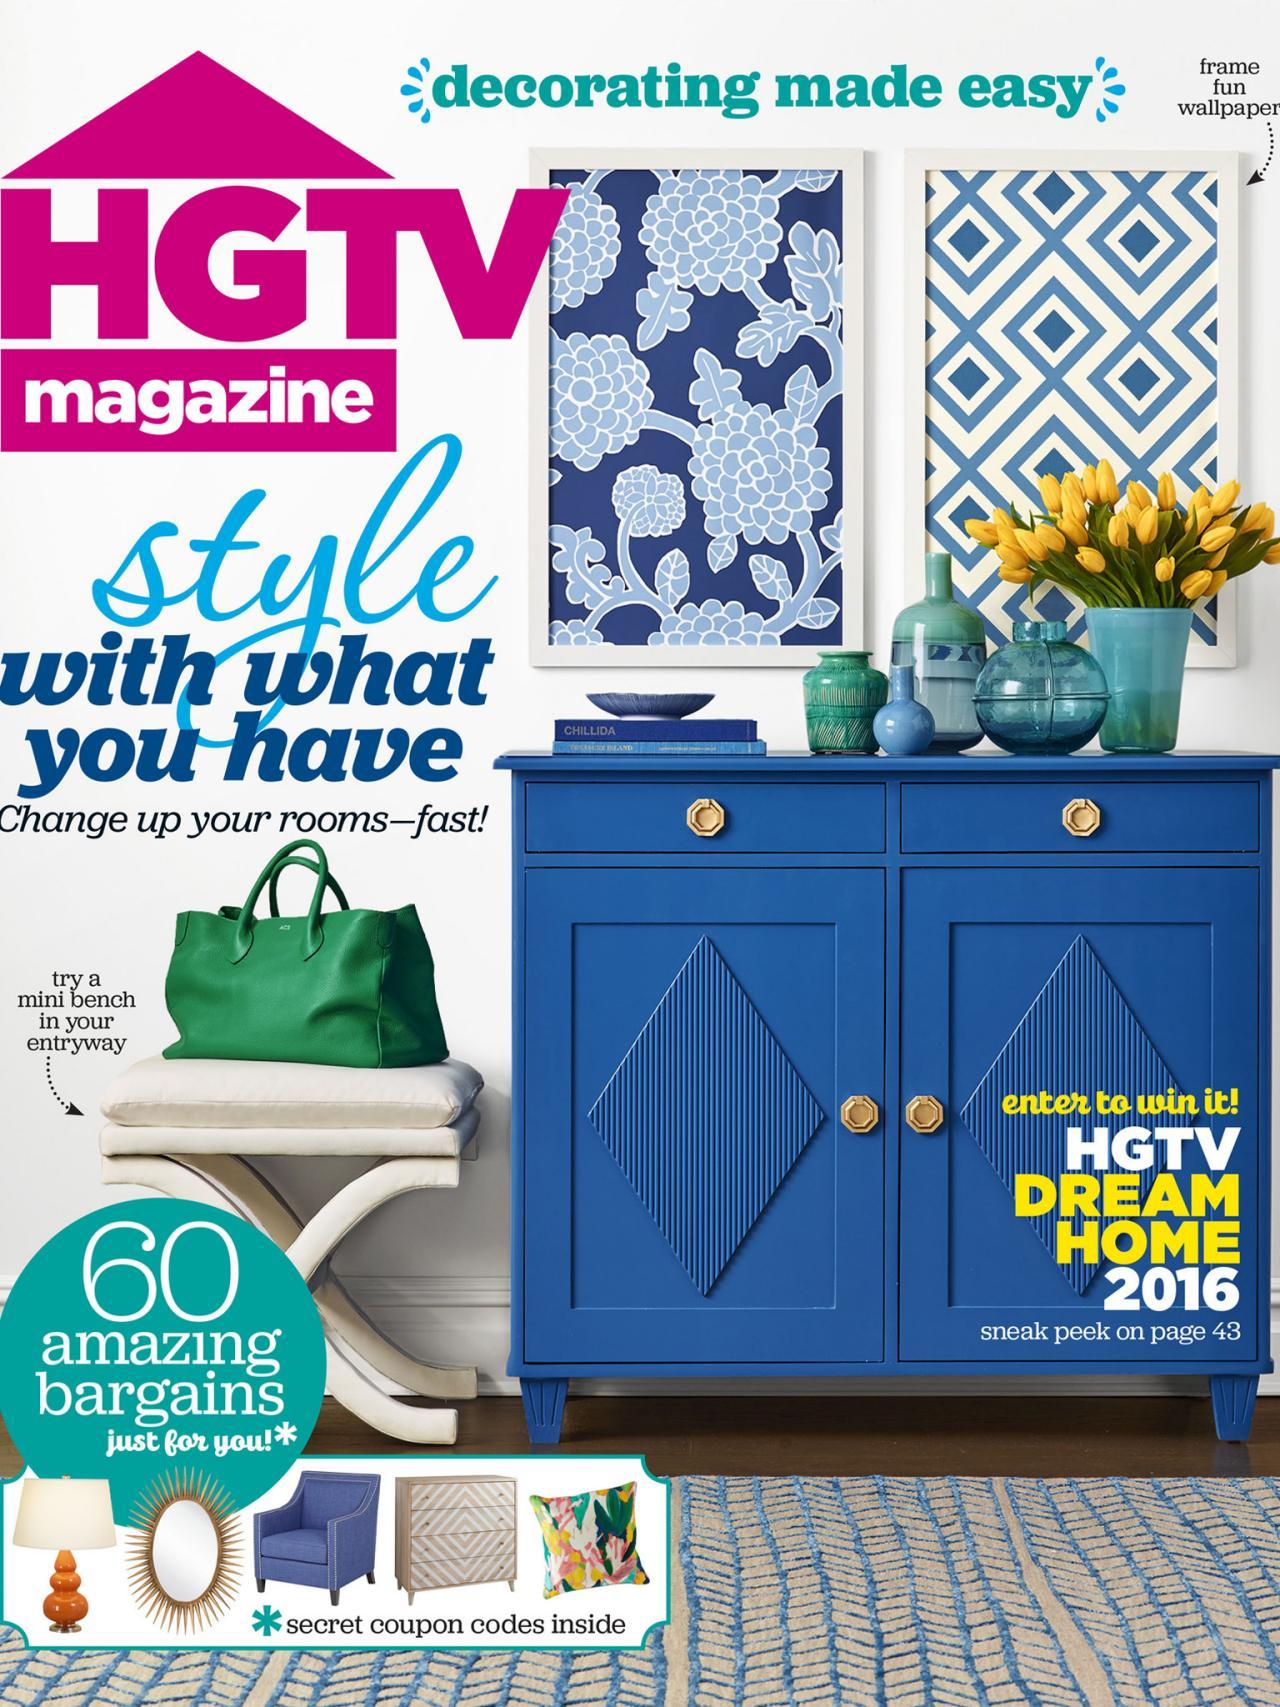 HGTV Magazine: January/February 2016